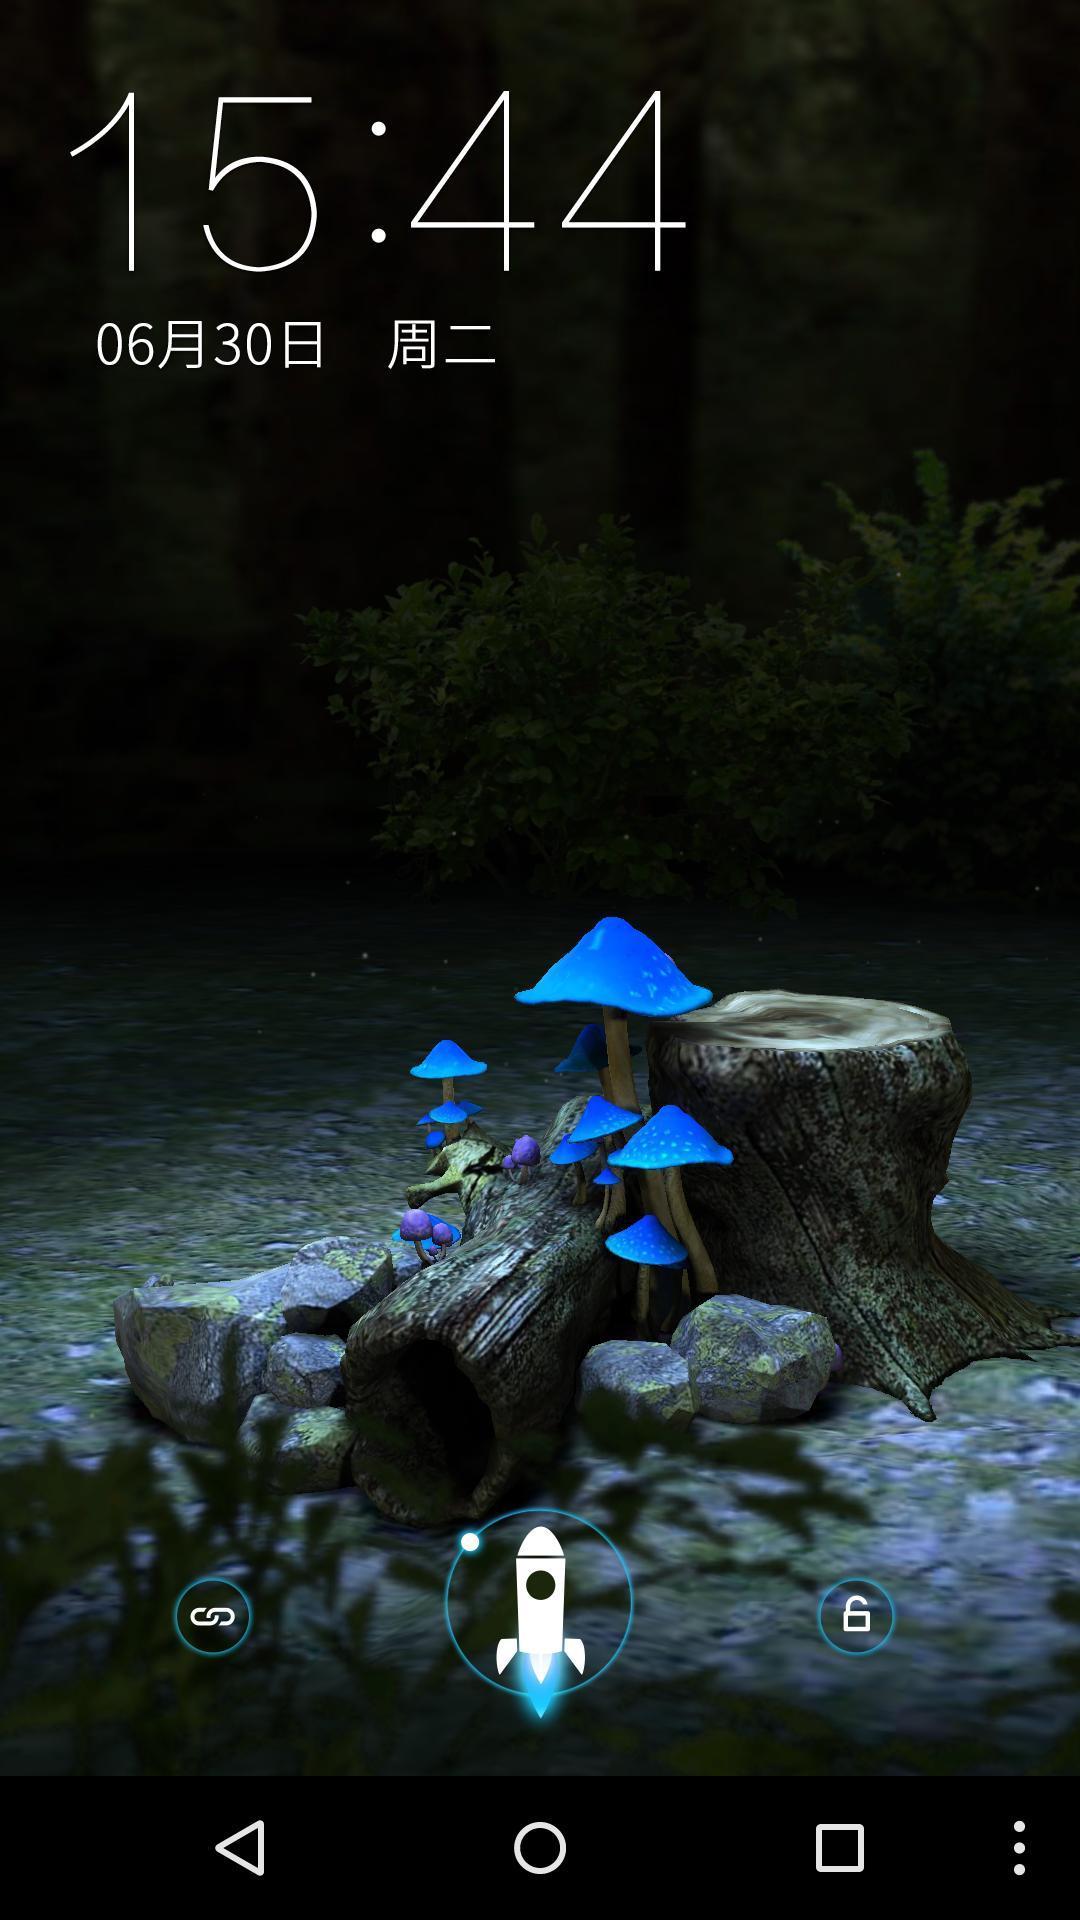 3D森林的梦 梦象动态壁纸下载